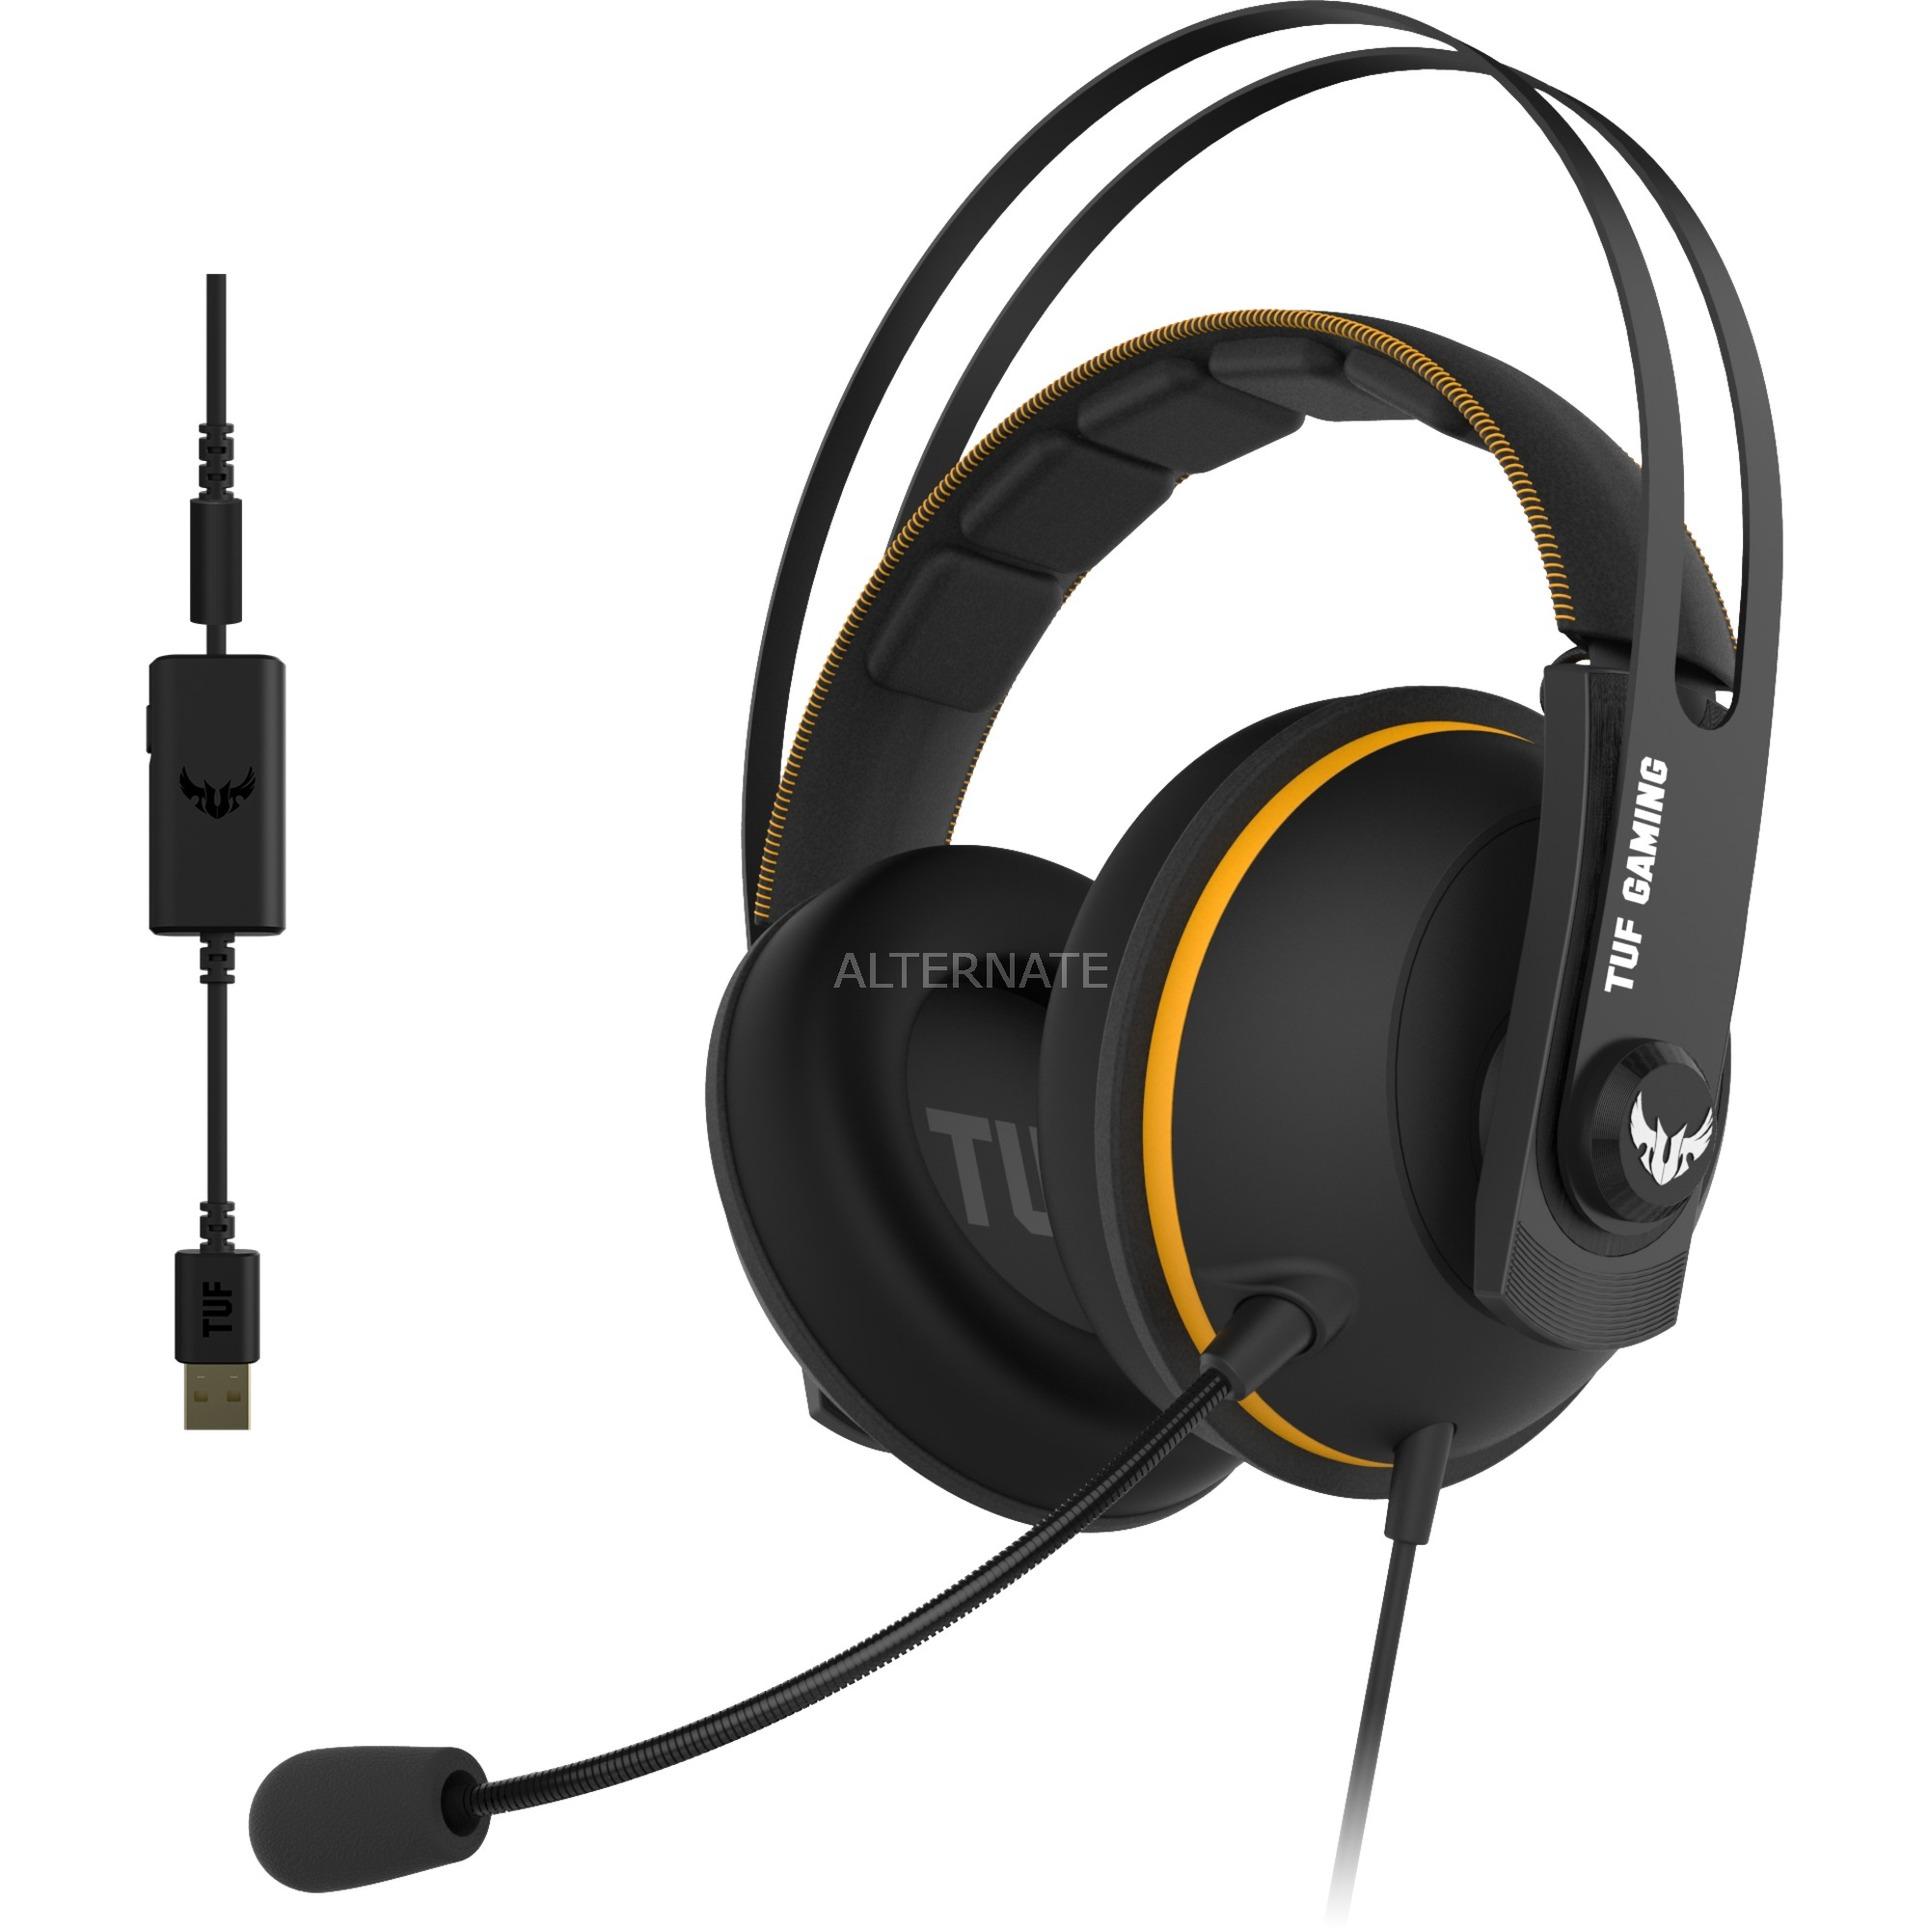 90YH01MY-B8UA00, Auriculares con micrófono